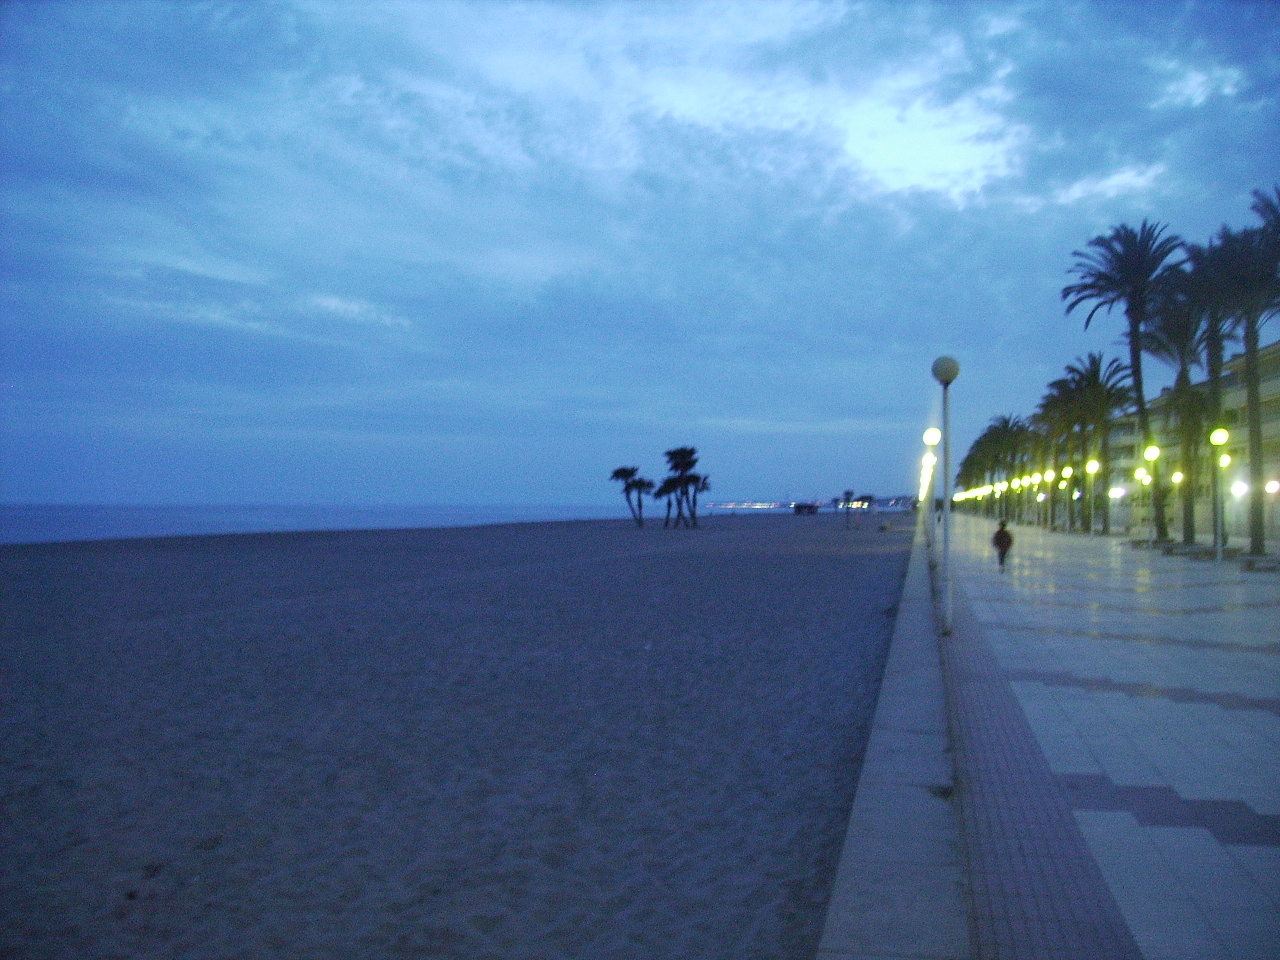 Playa Les Madrigueres